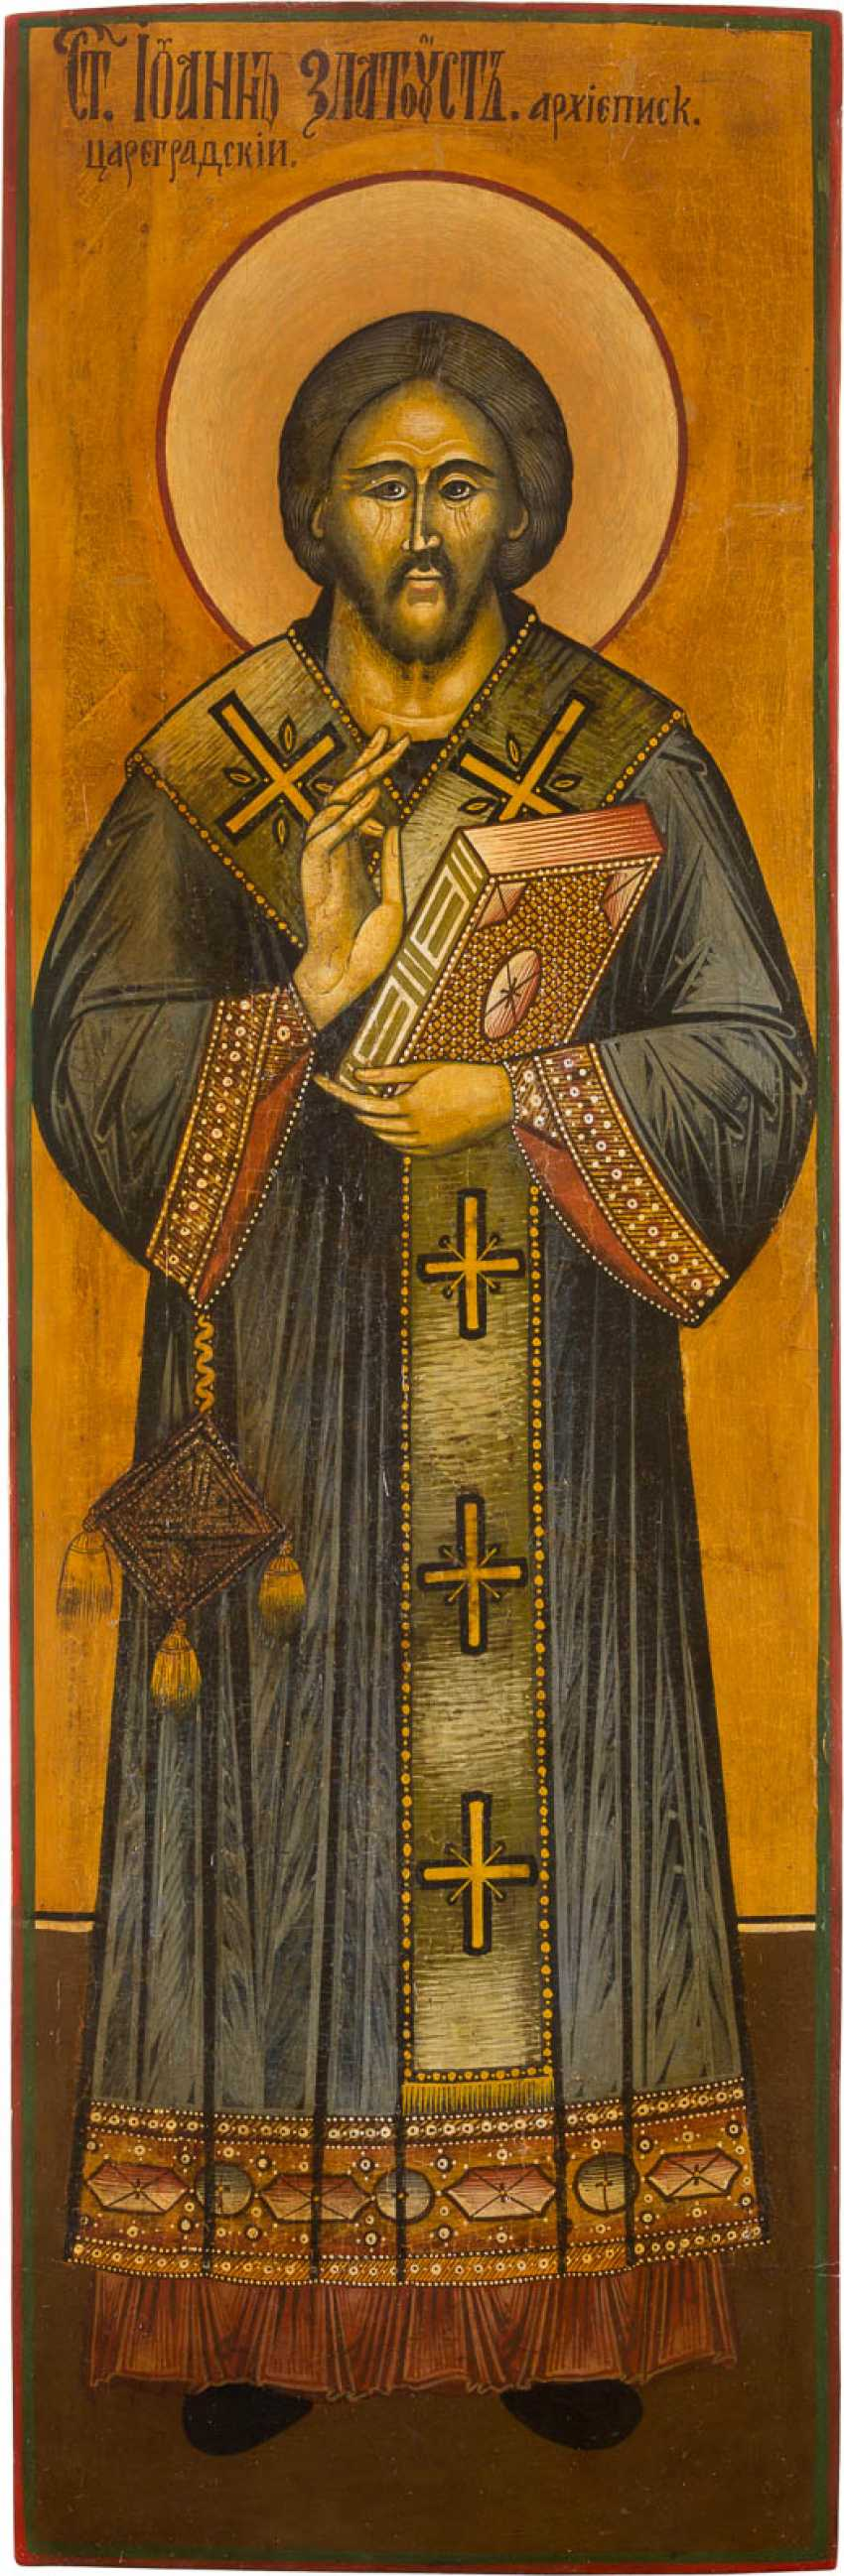 A BIG ICON WITH SAINT JOHN CHRYSOSTOM - photo 1